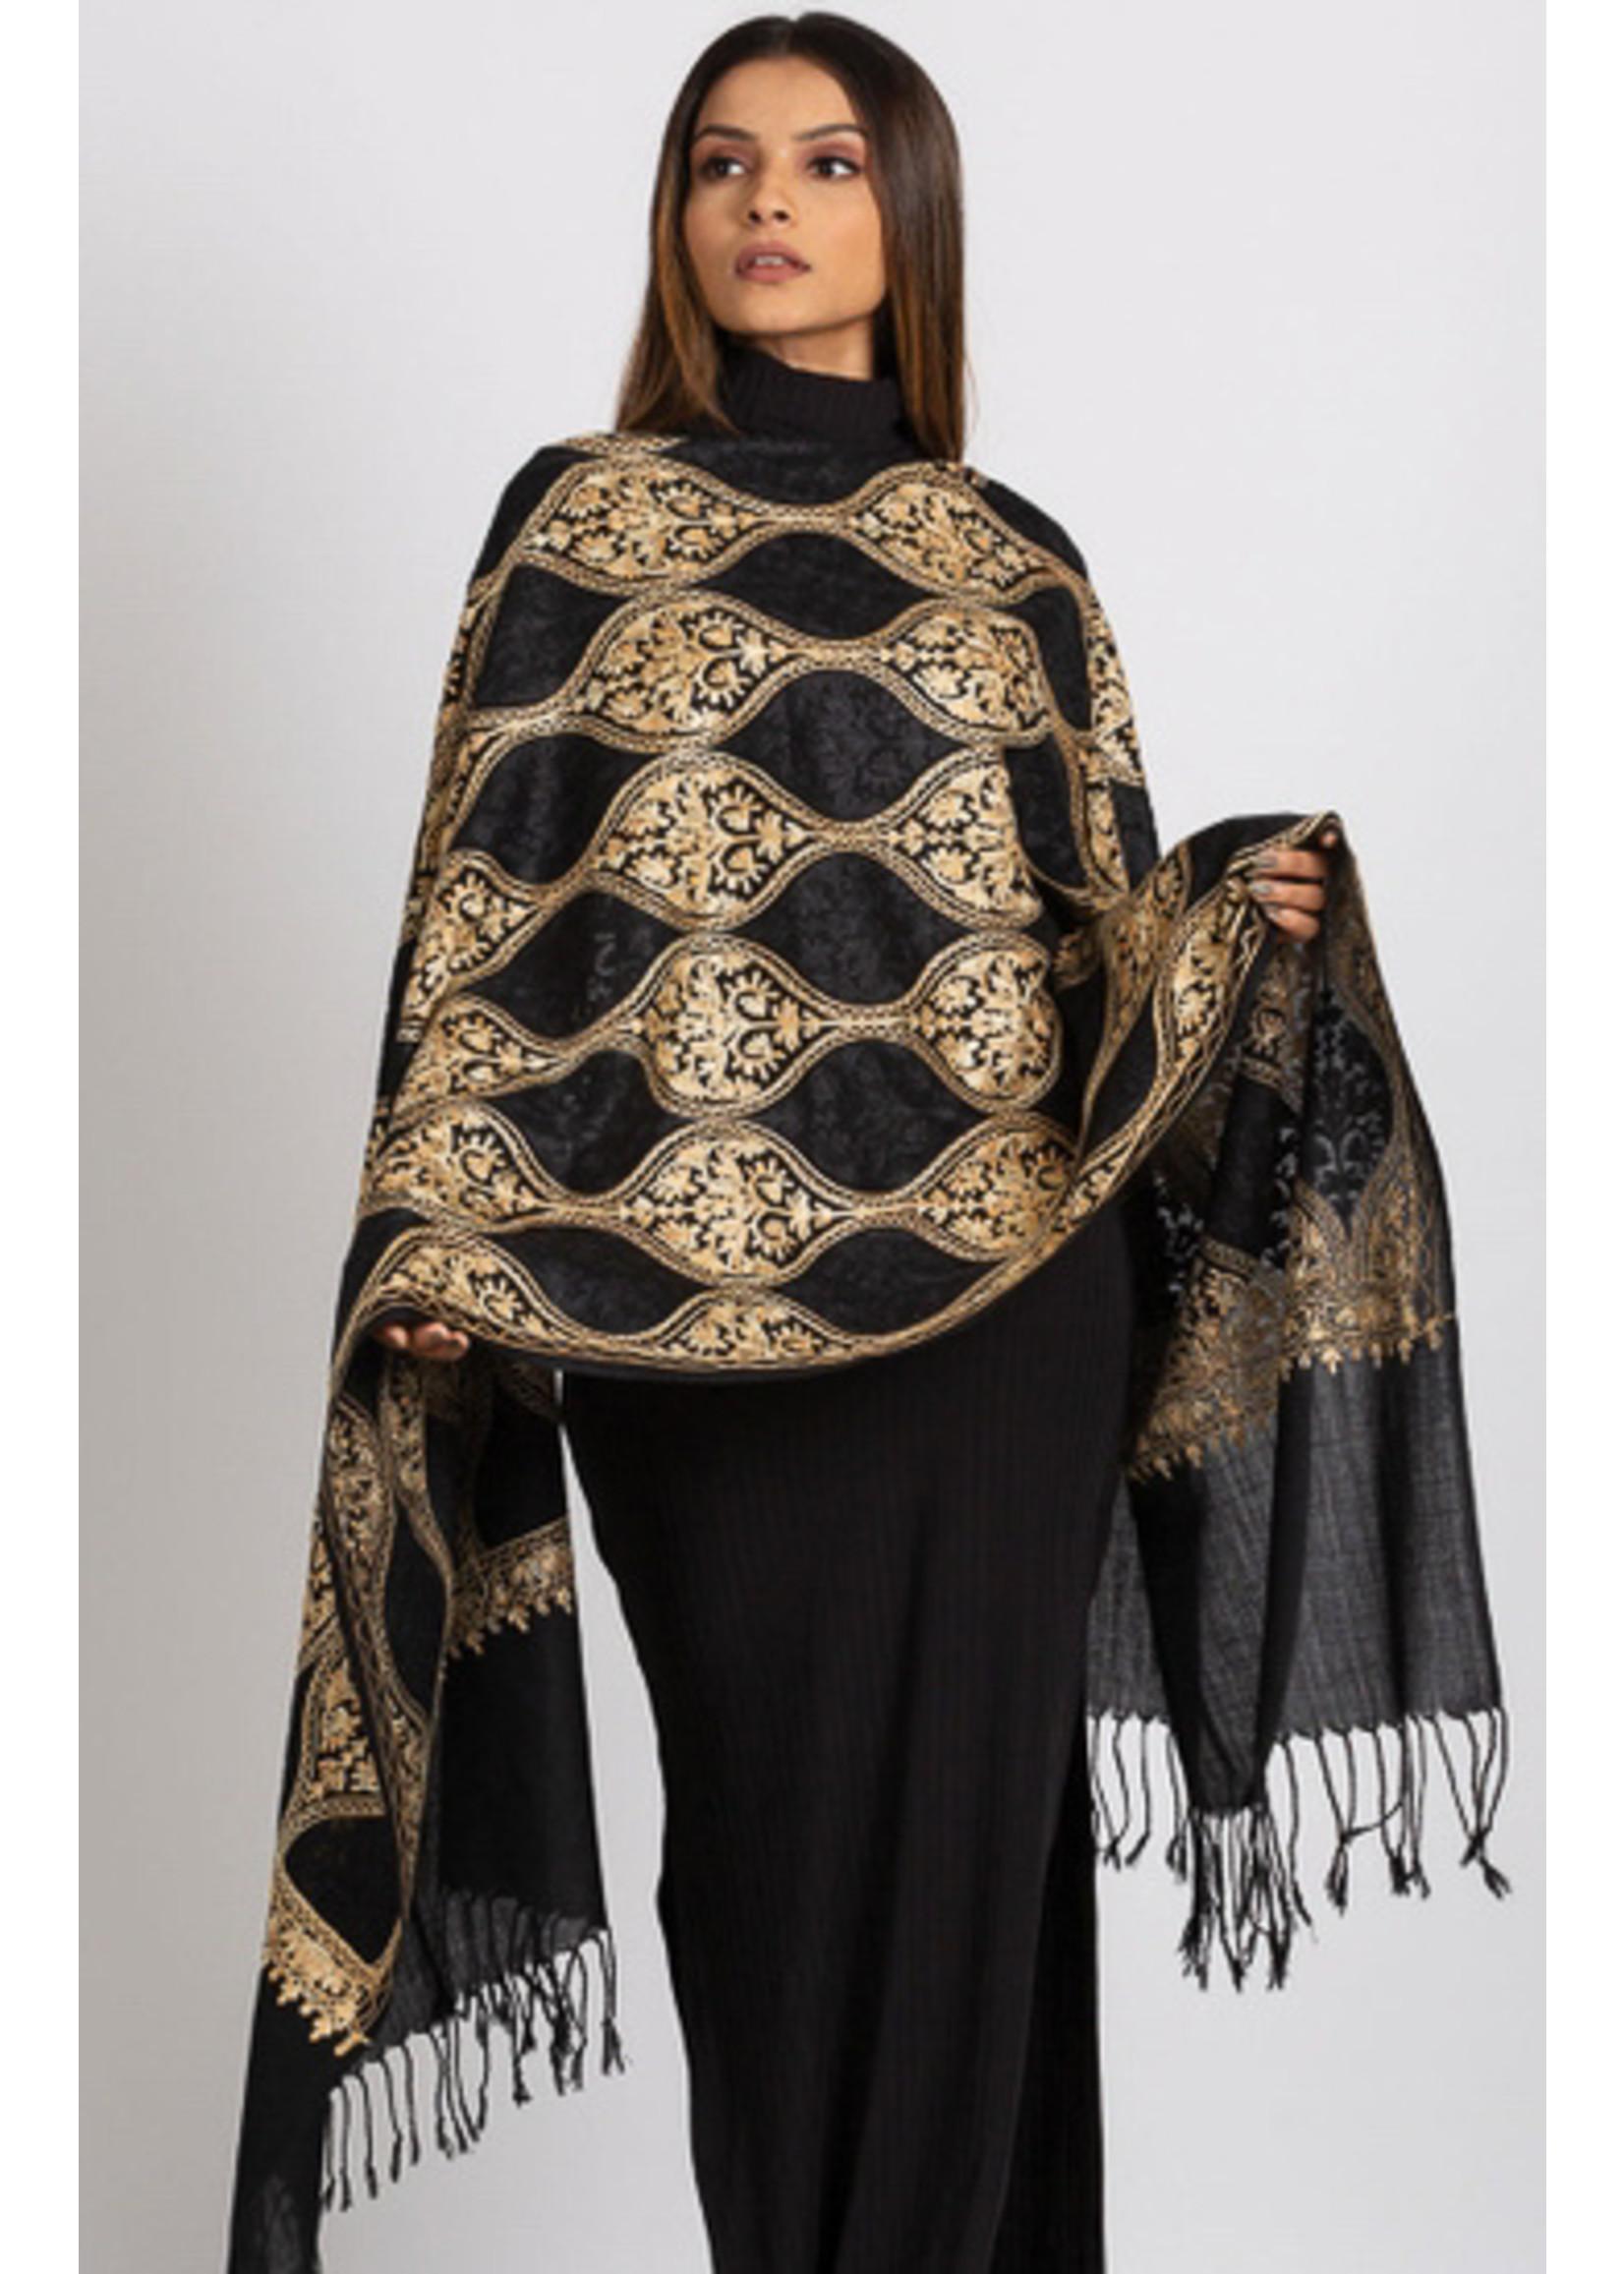 Surani Embroidered Shawls